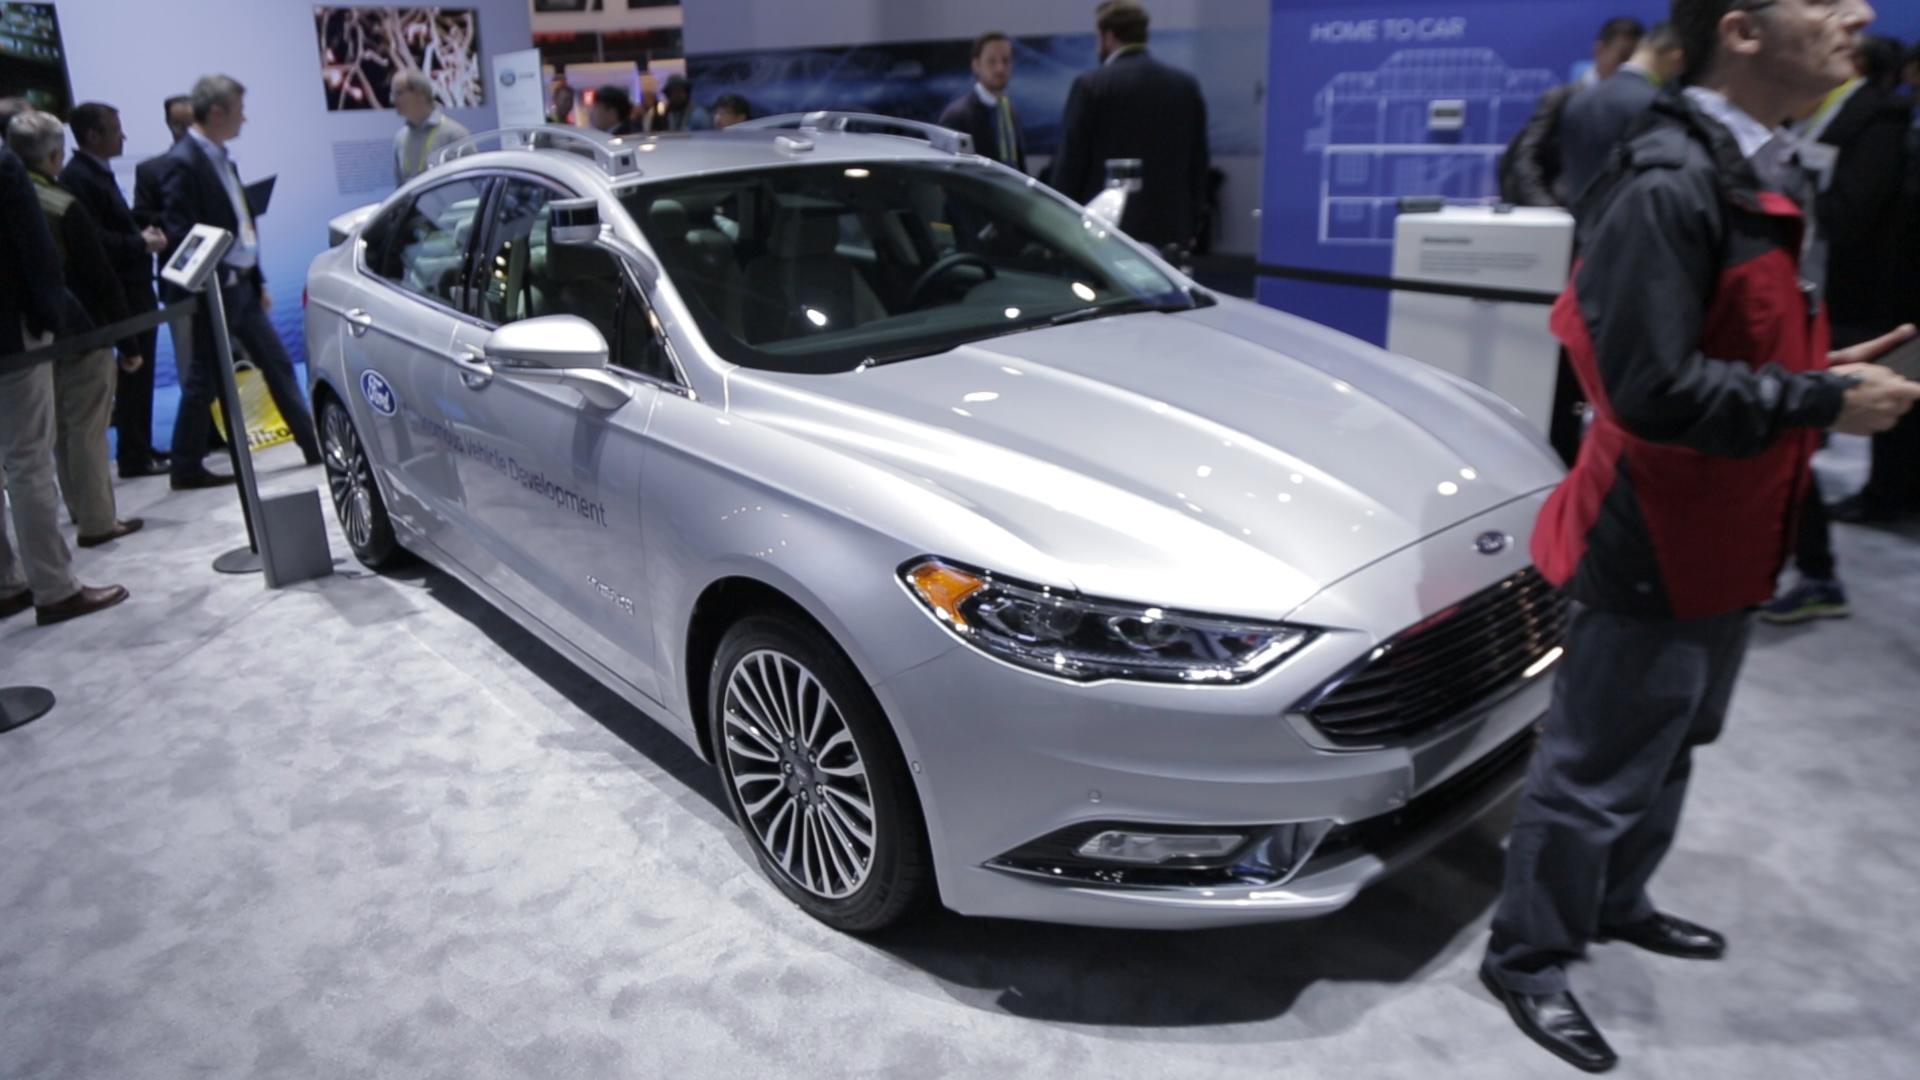 Up close with Ford's new autonomous development Fusion Hybrid car